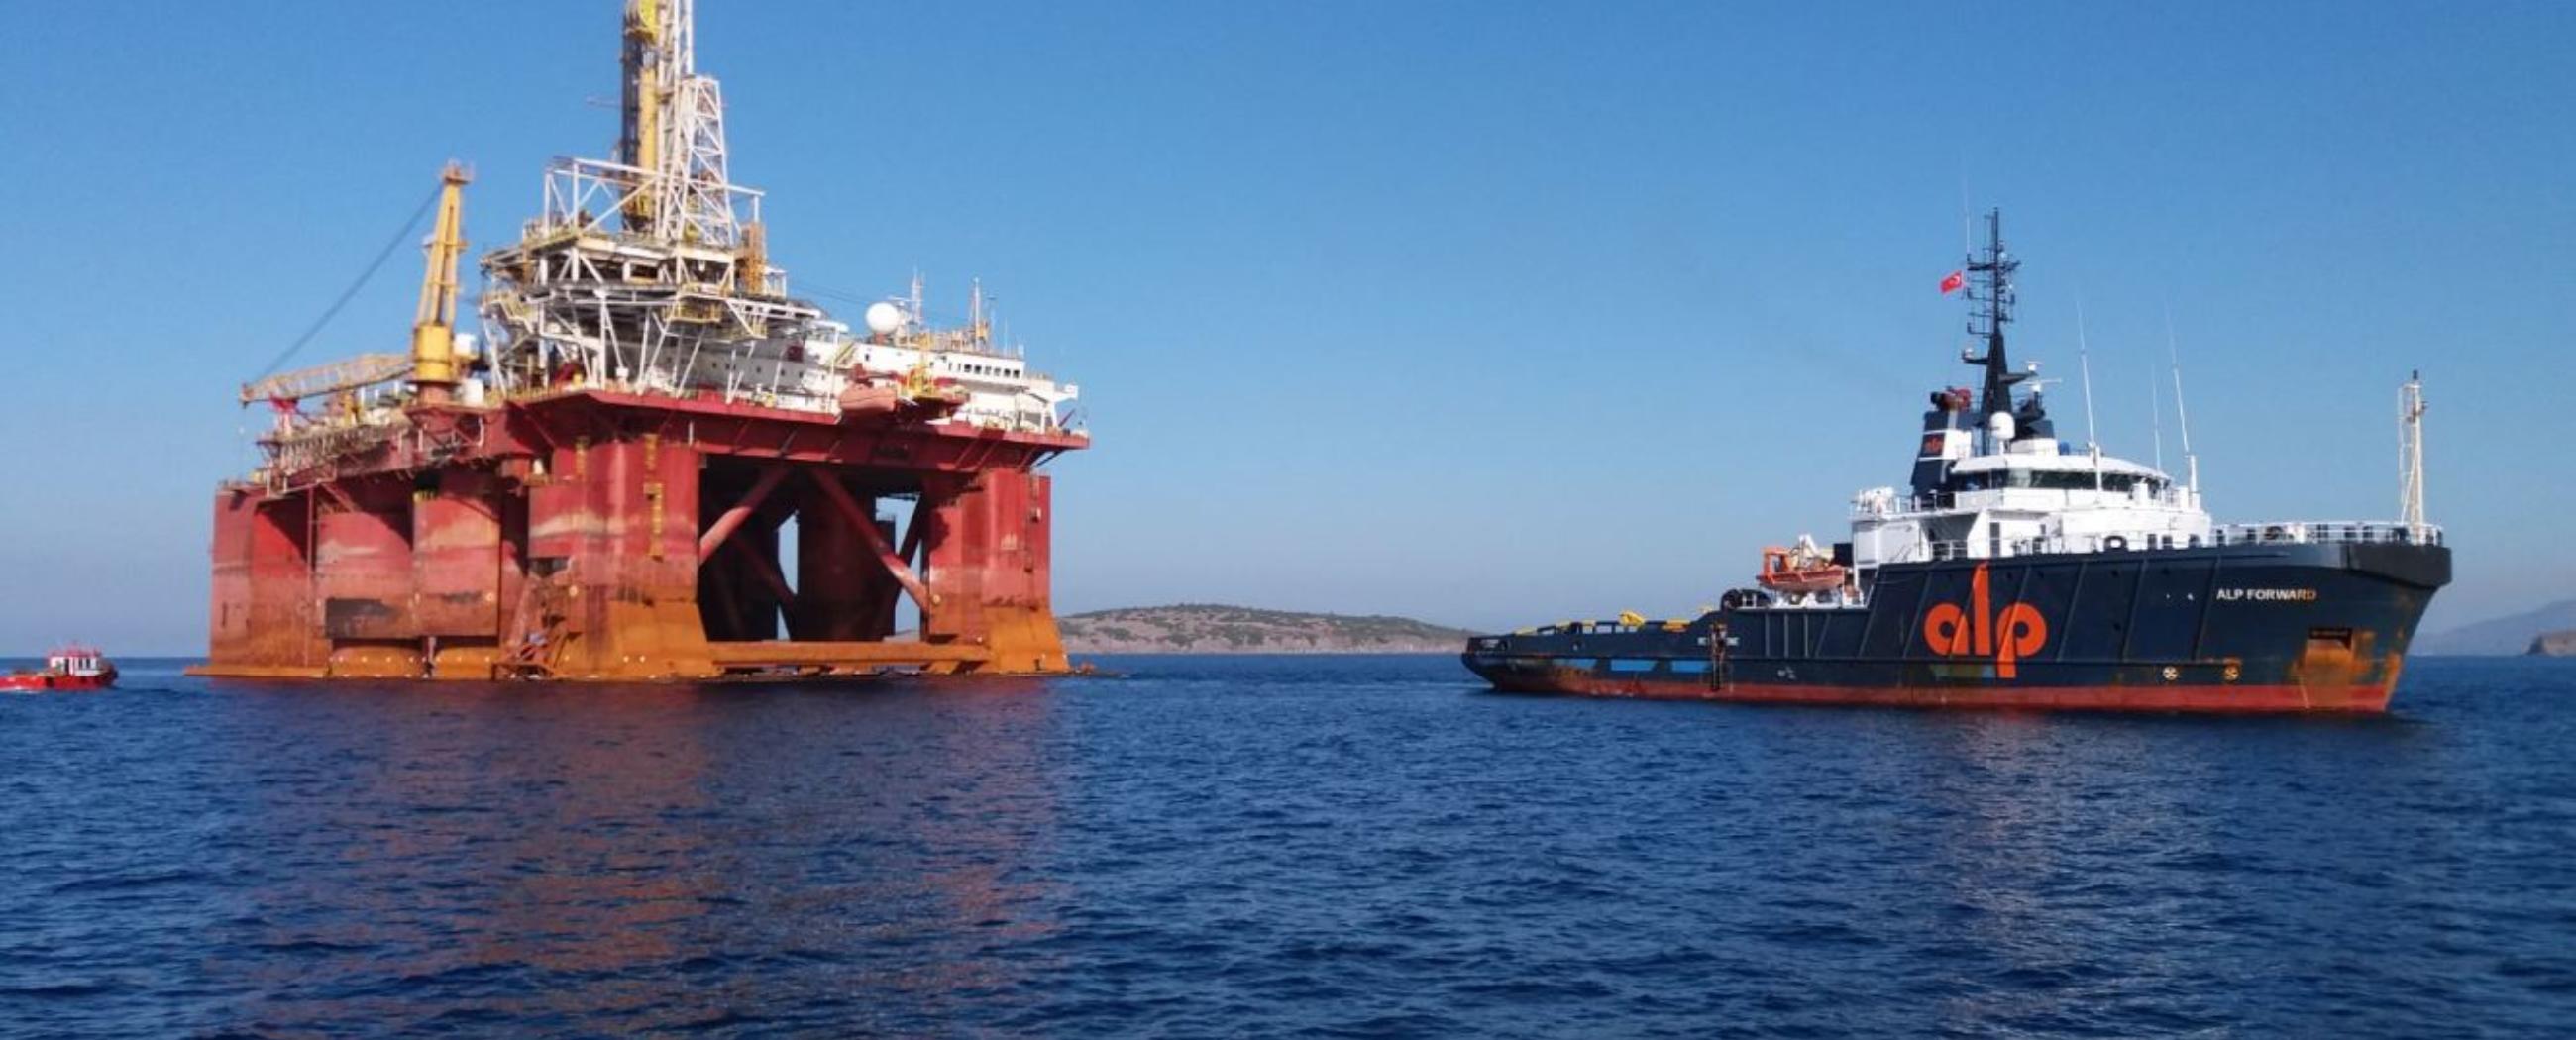 ALP Forward_SSDR ODN Tay IV ROTA Spain - Turkey Aliaga towage.jpeg